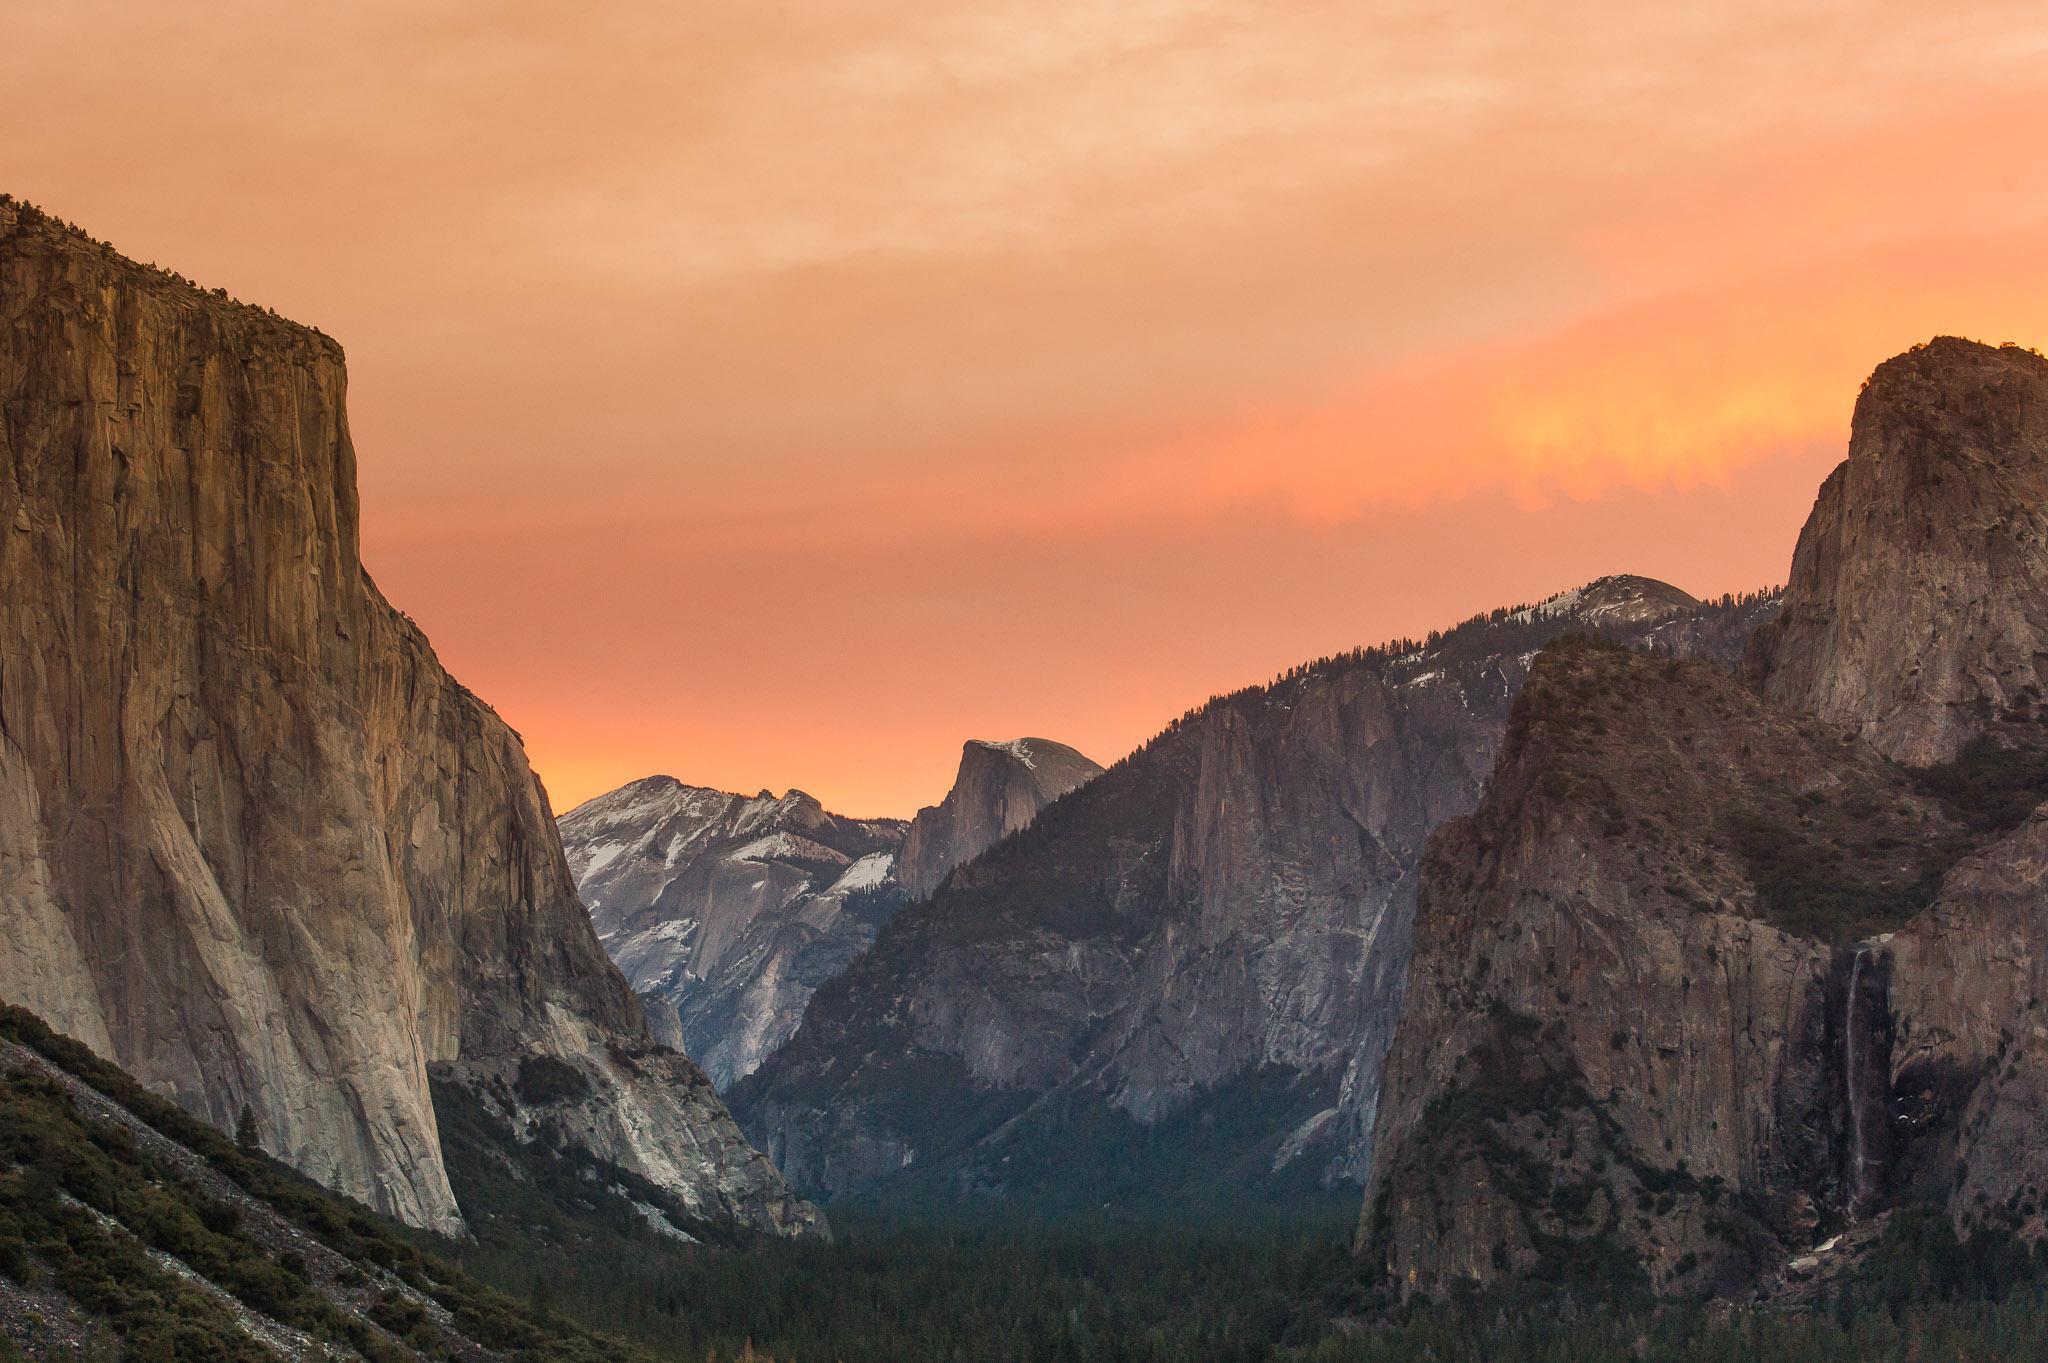 Jason-Davis-Images-Yosemite-0008.jpg